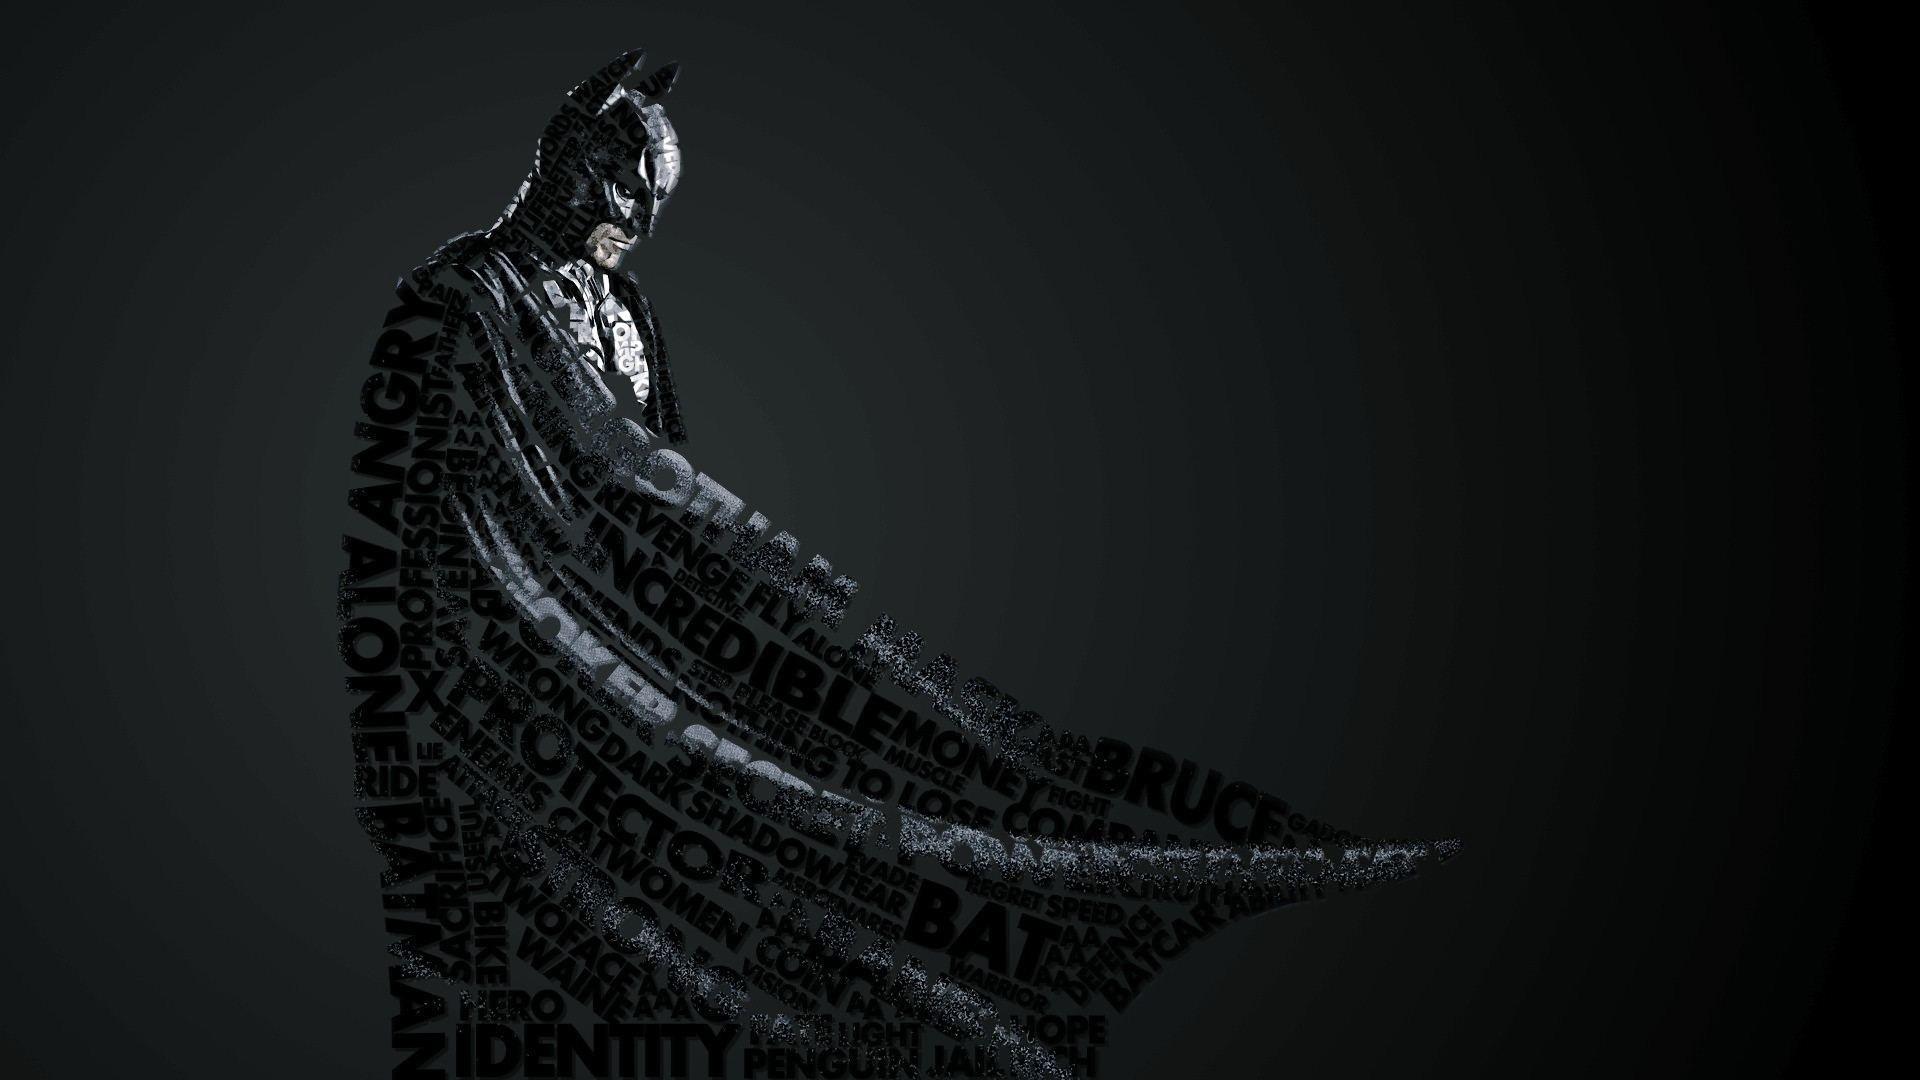 1920x1080 Latest Full HD 1080p Joker Wallpapers Desktop Backgrounds